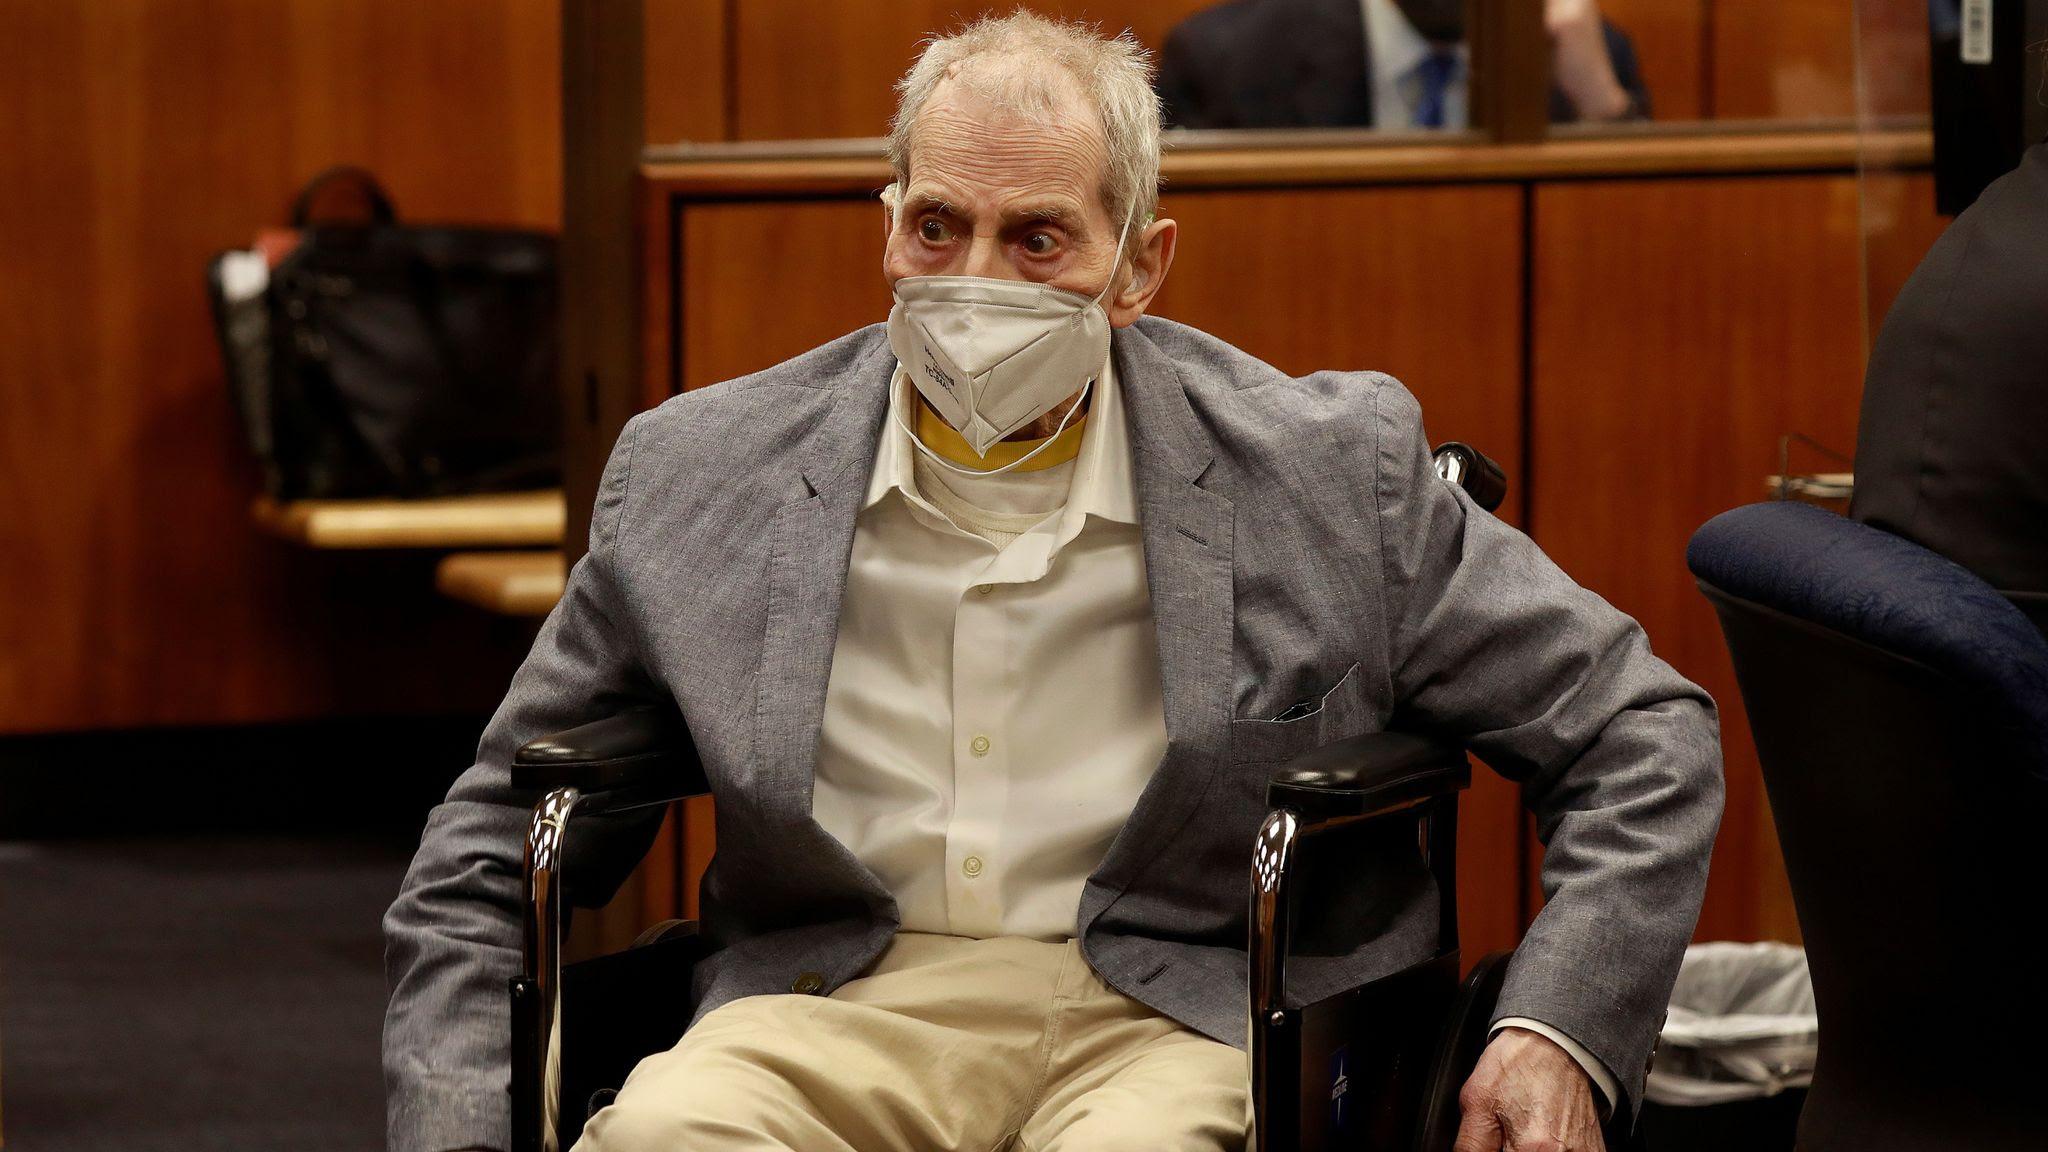 Real estate heir Robert Durst jailed for murder of best friend